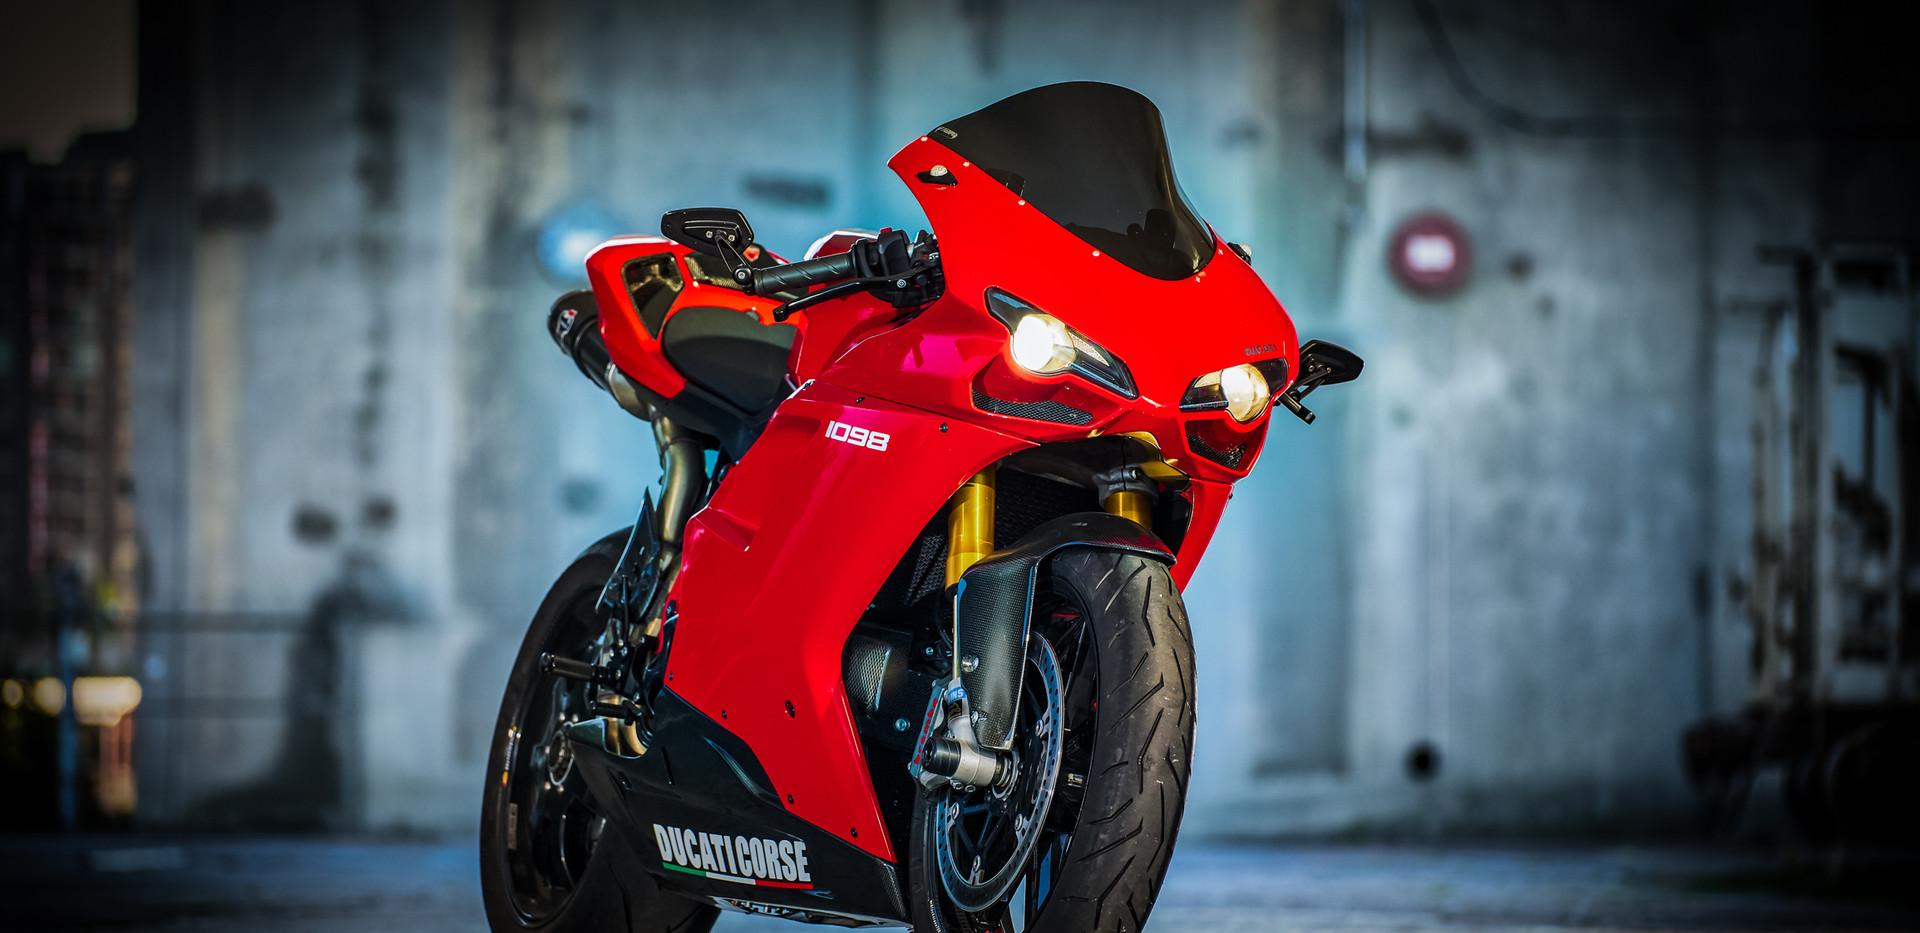 The Image Engine Ducati 1098